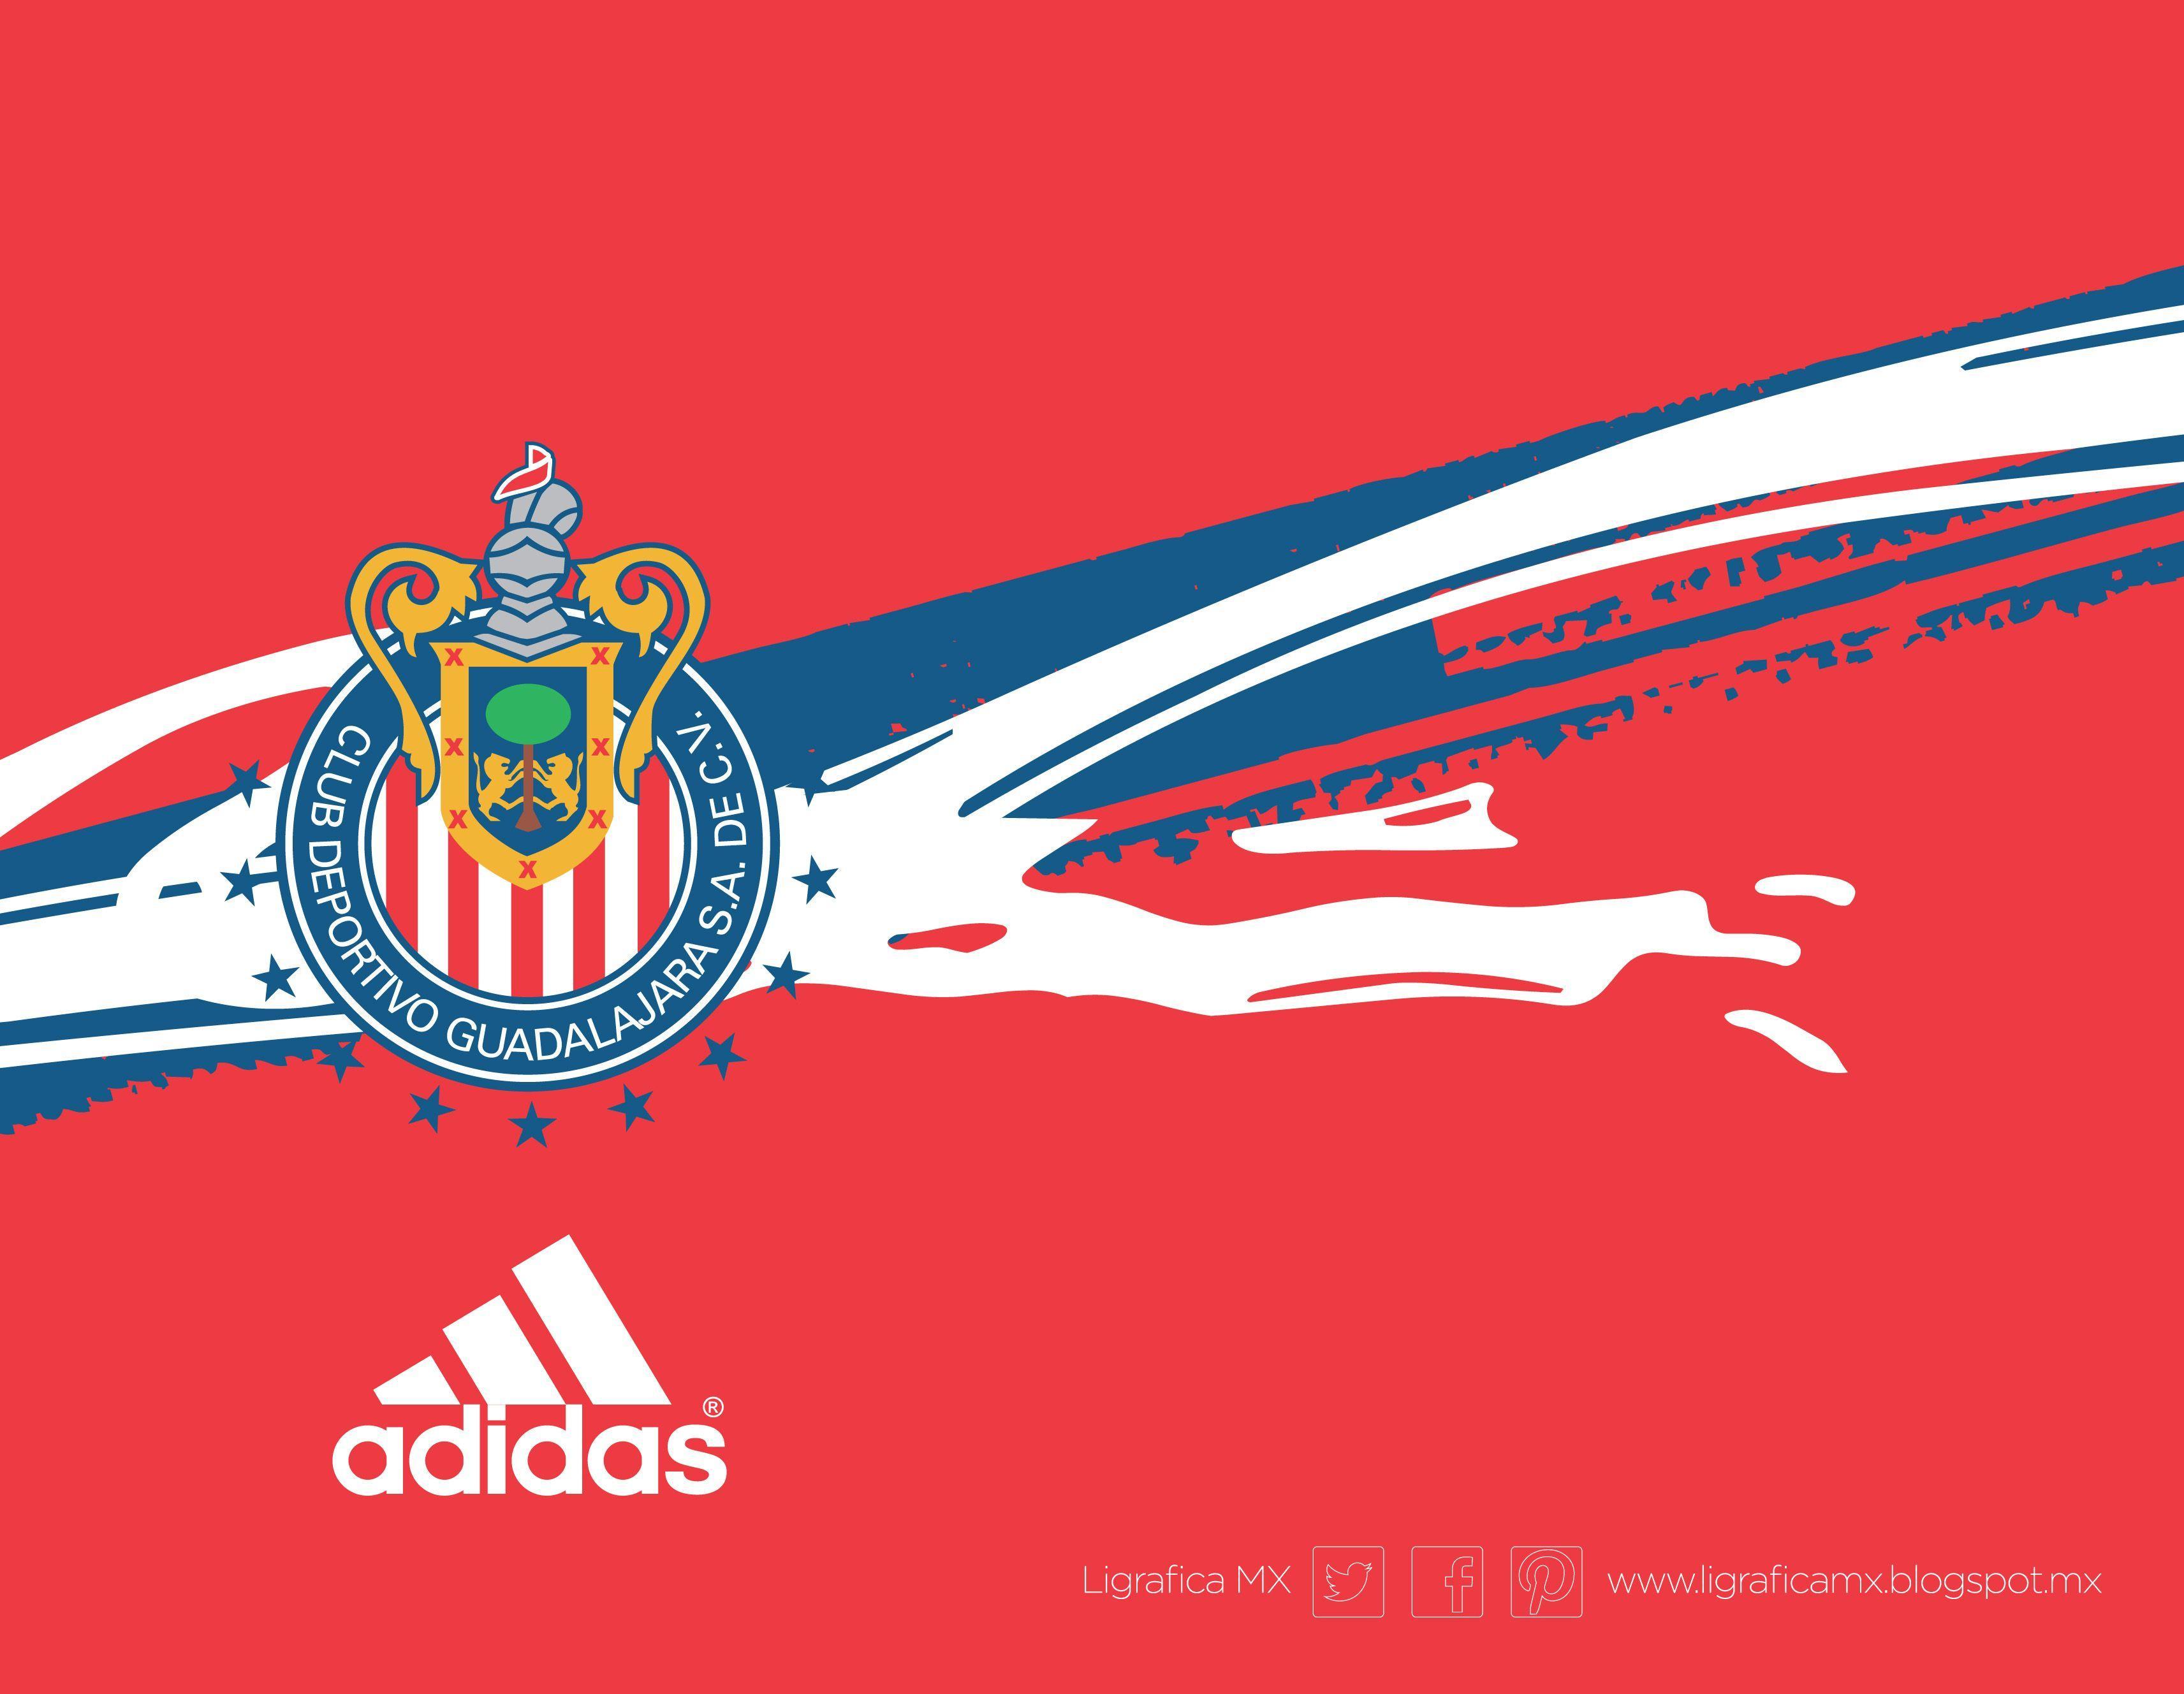 Adidas Logo 3d Wallpapers Hd Chivas Wallpapers 2017 Wallpaper Cave